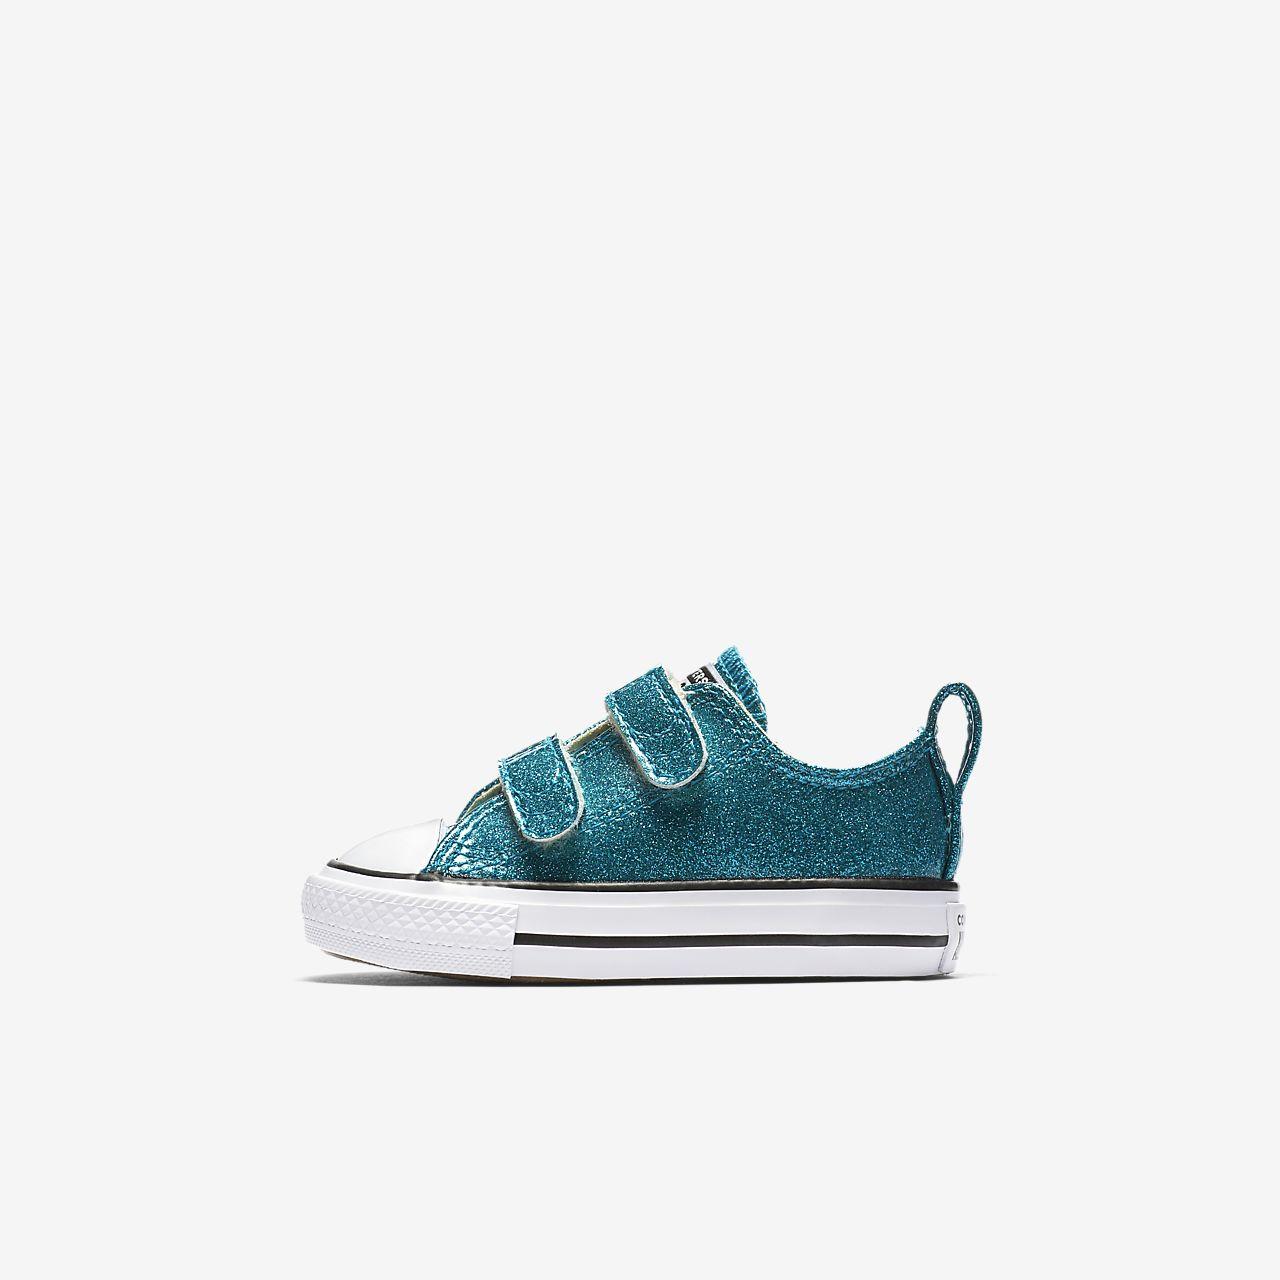 converse shoes glitter